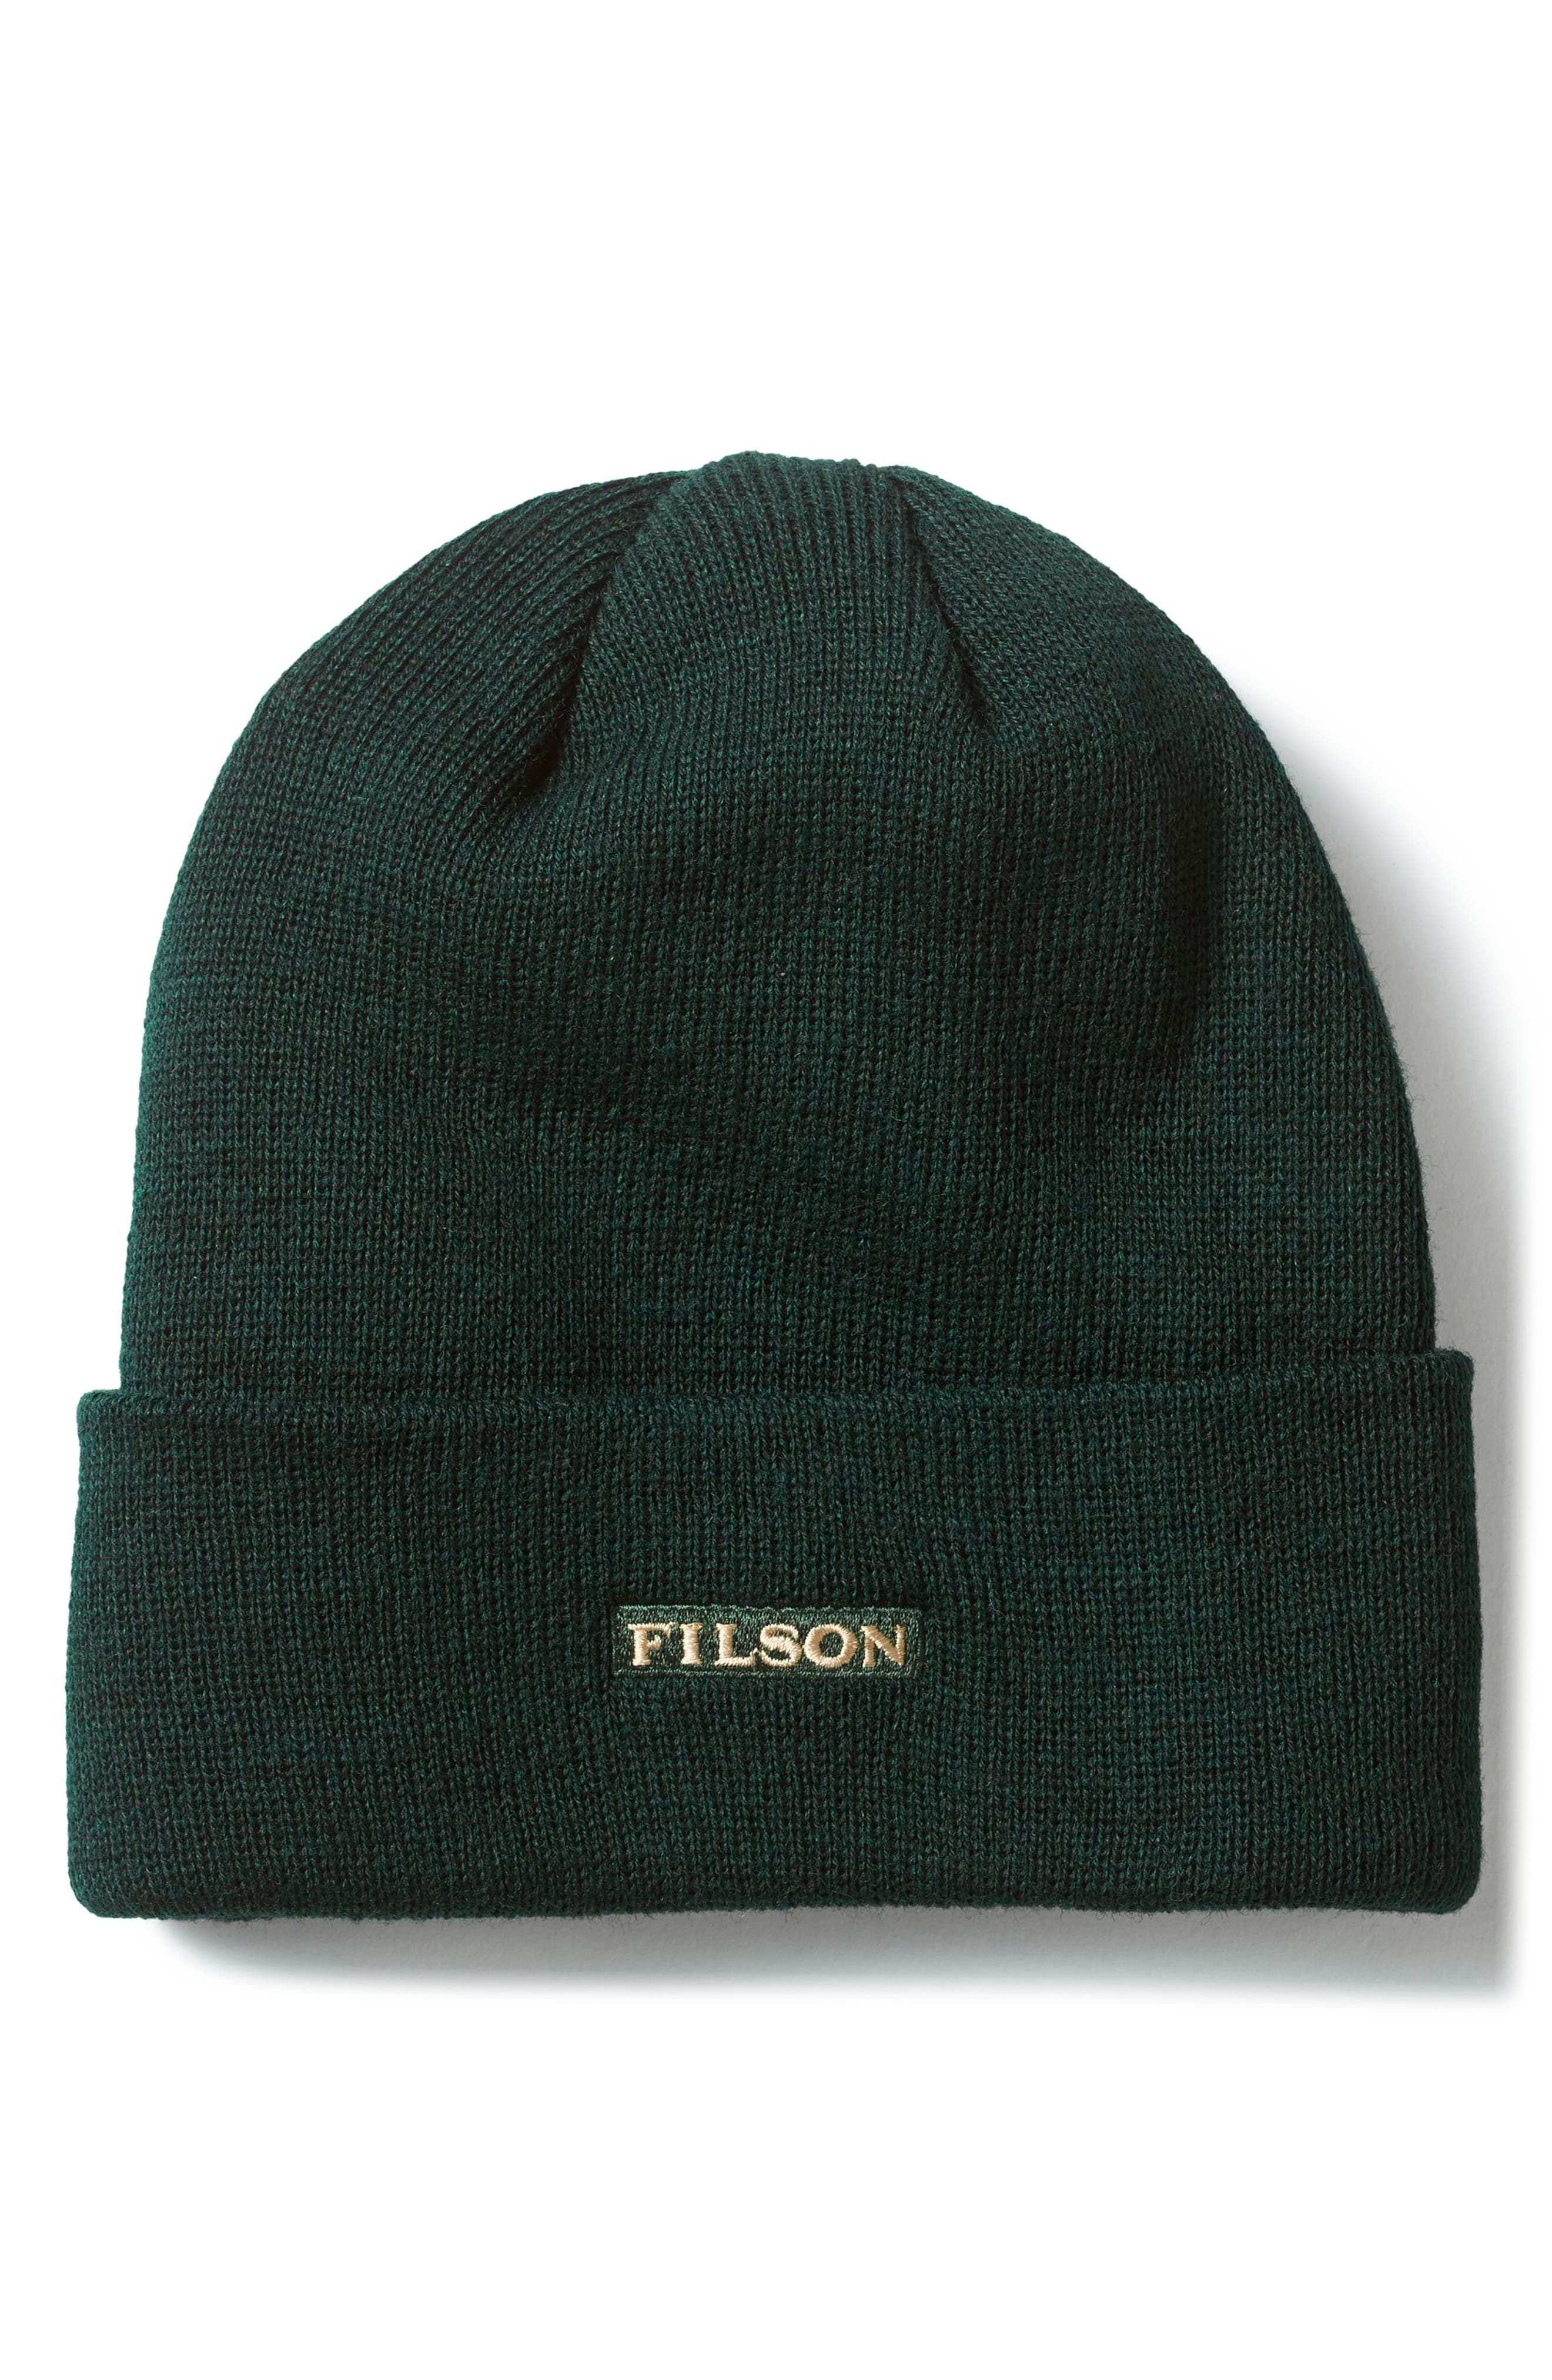 Filson Wool Cap